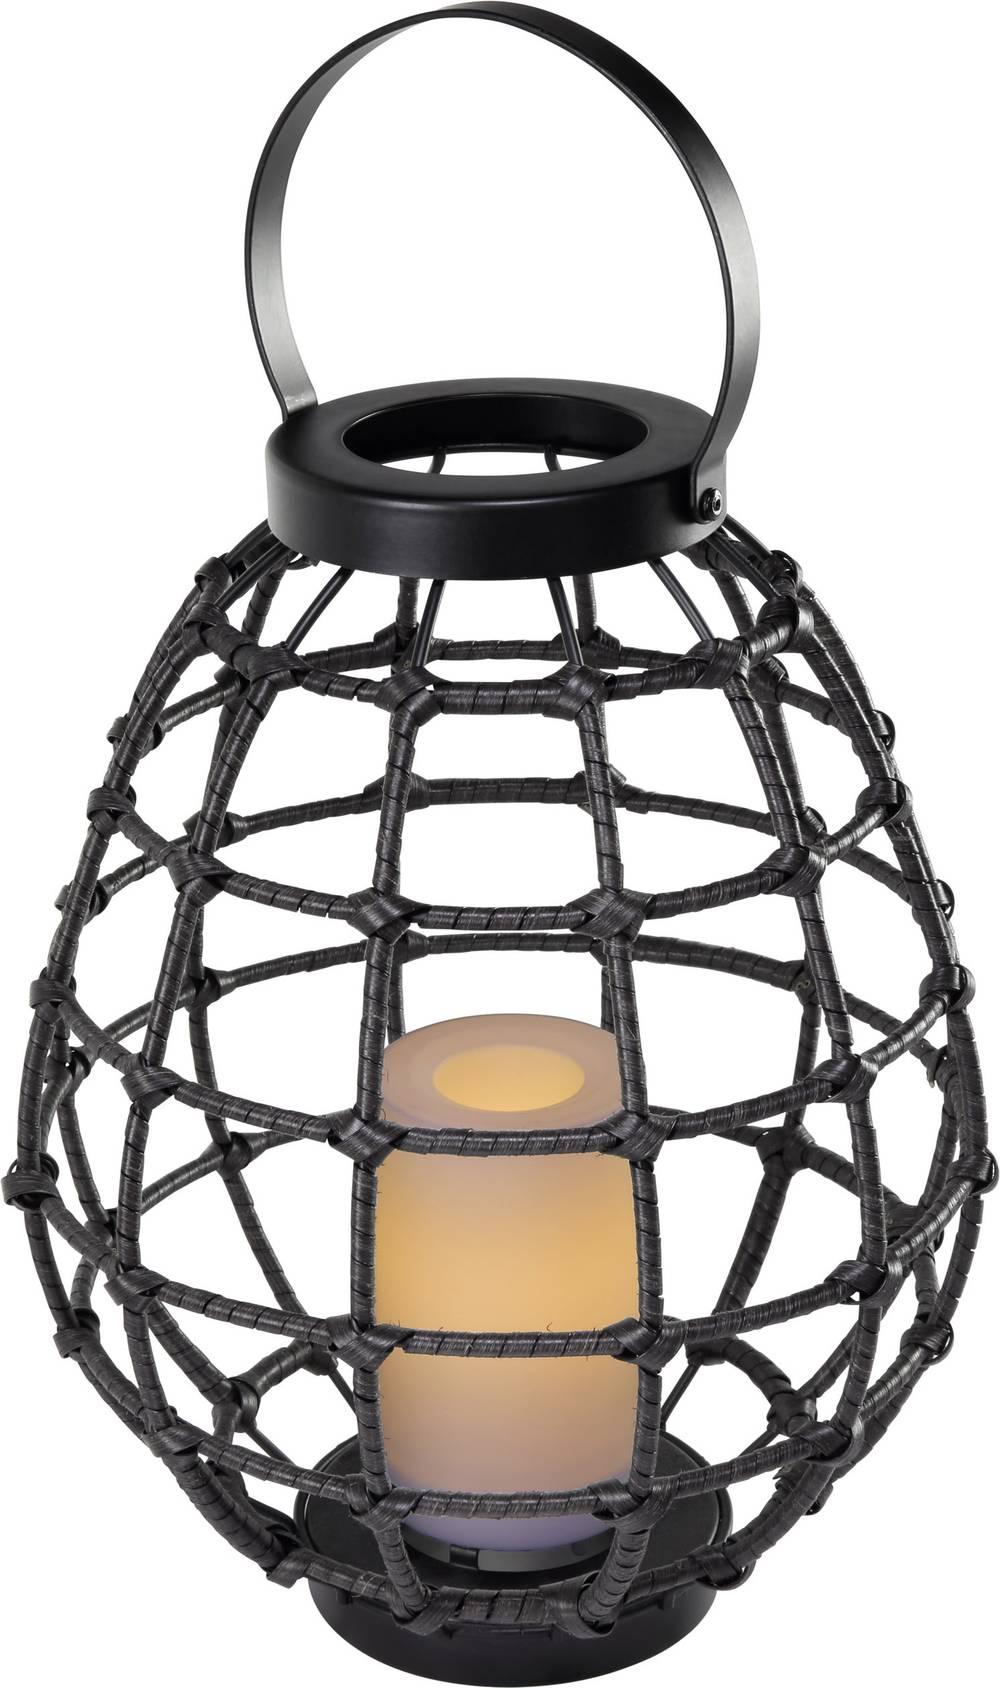 Polarlite-Rattan-330-PL-8375085-Dekoleuchte-LED-0-06W-Amber-Dunkelbraun